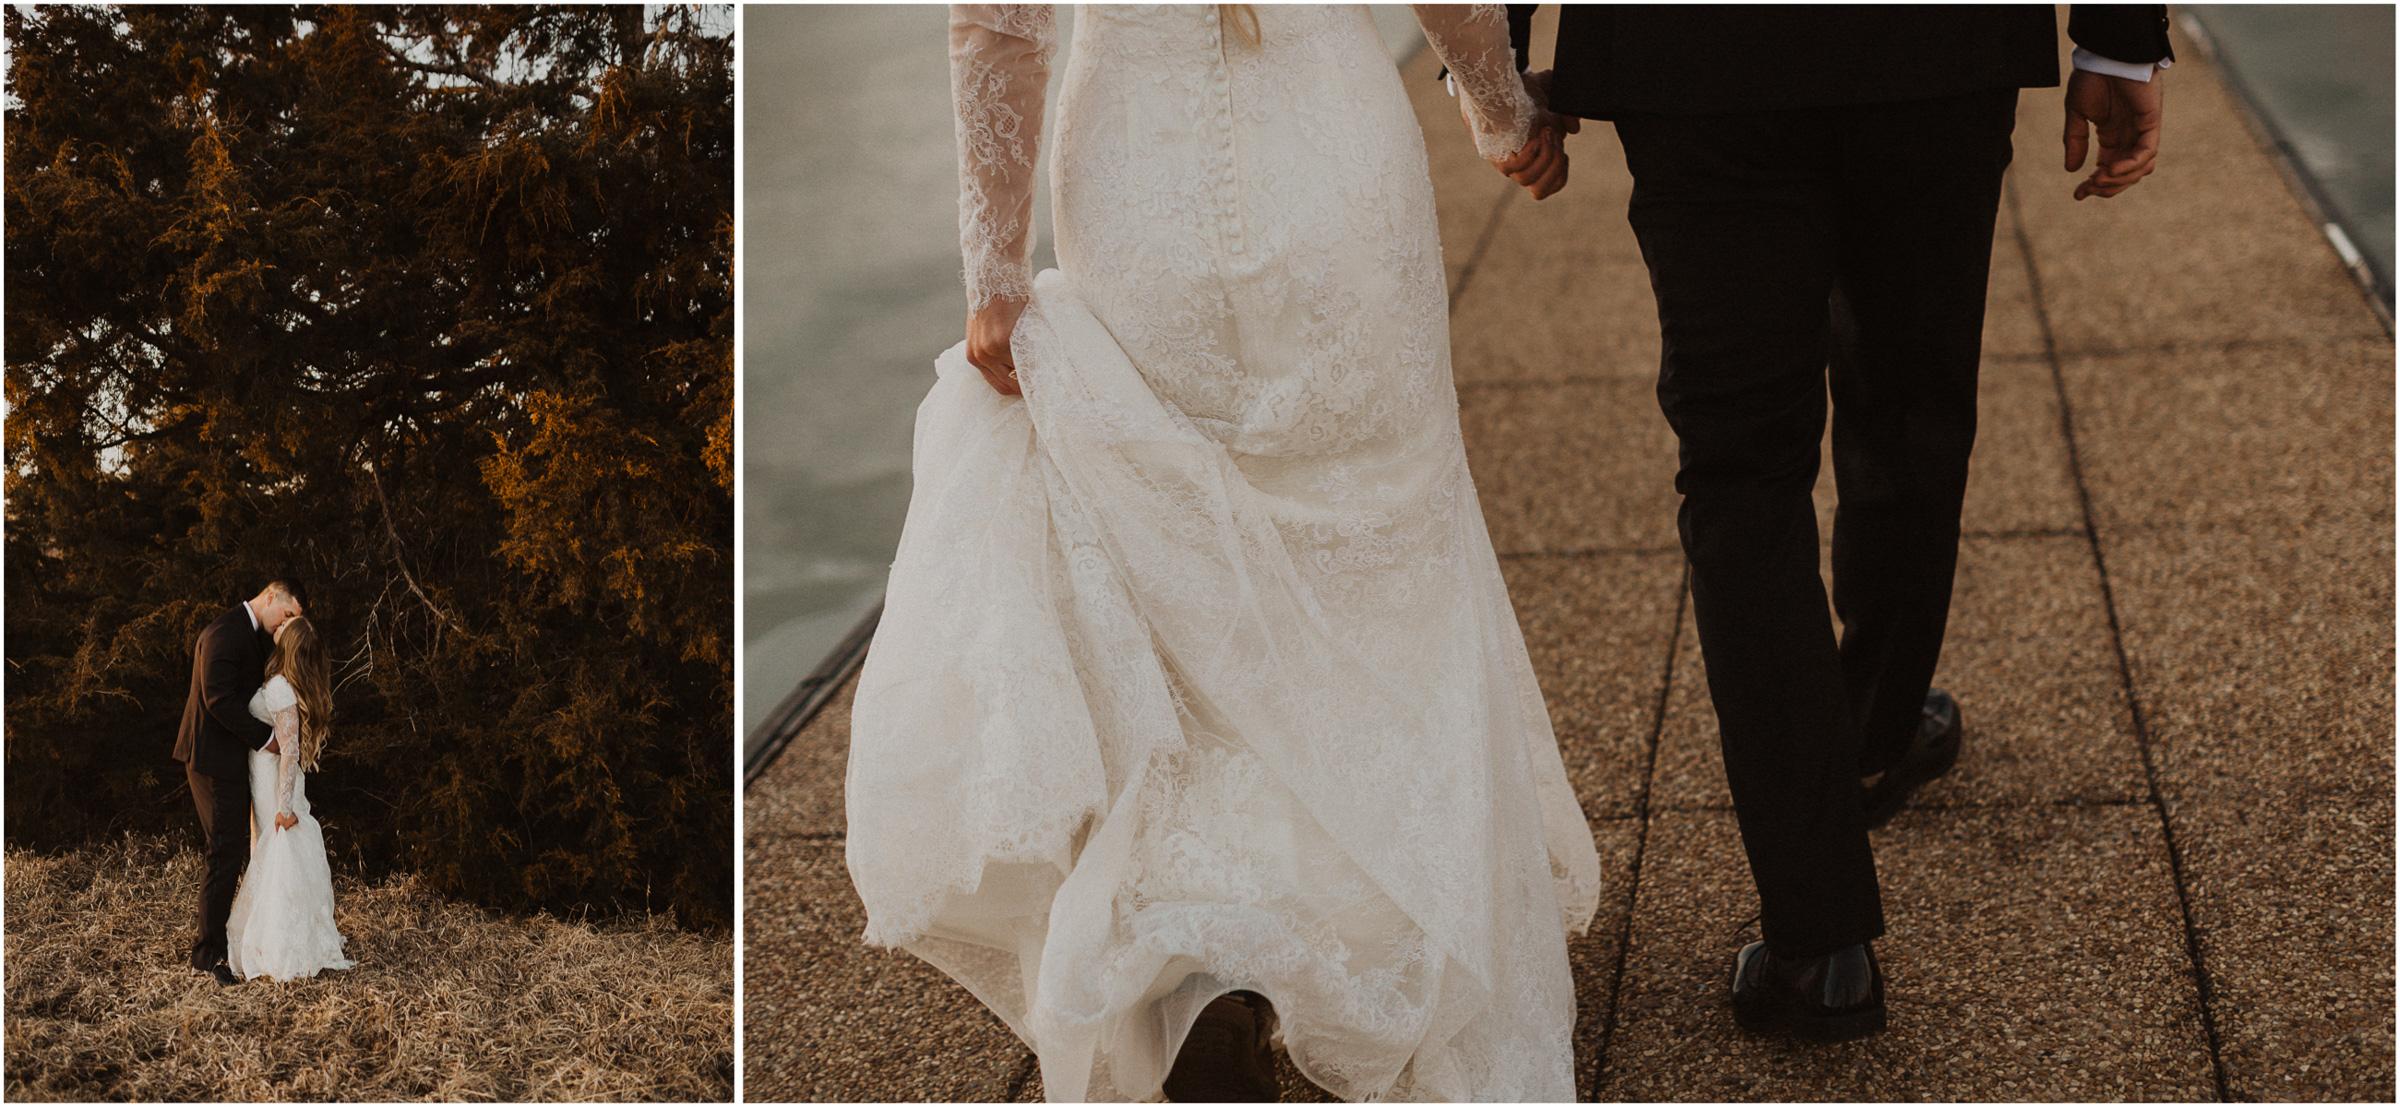 alyssa barletter photography shawnee mission park winter wedding 8th and main grandview missouri photographer-30.jpg